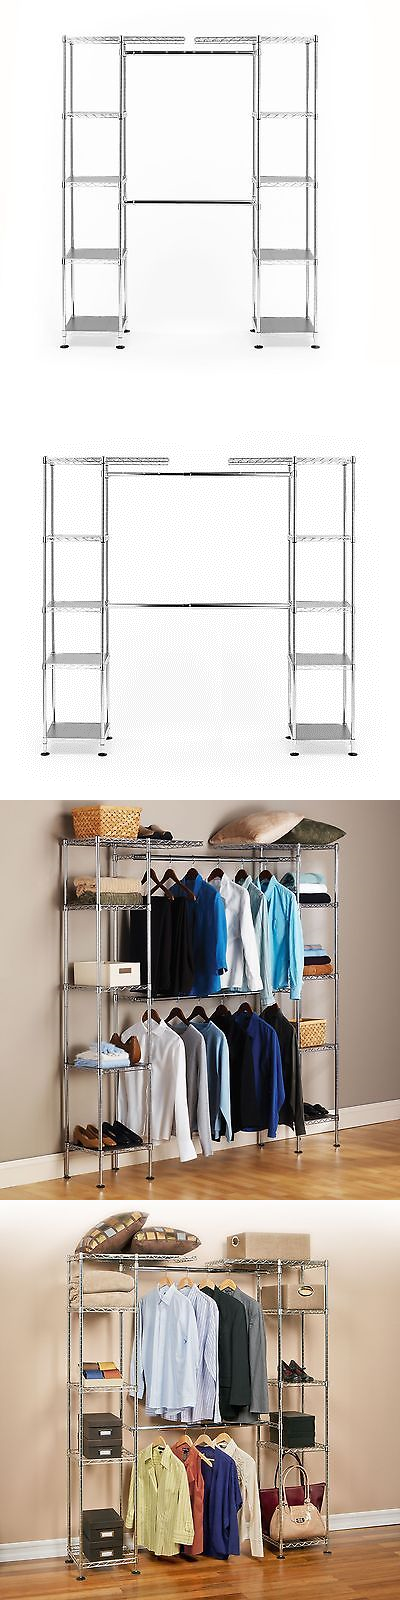 Closet Organizers 43503: Seville Classics Expandable Closet Room Organizer  New New New  U003e BUY